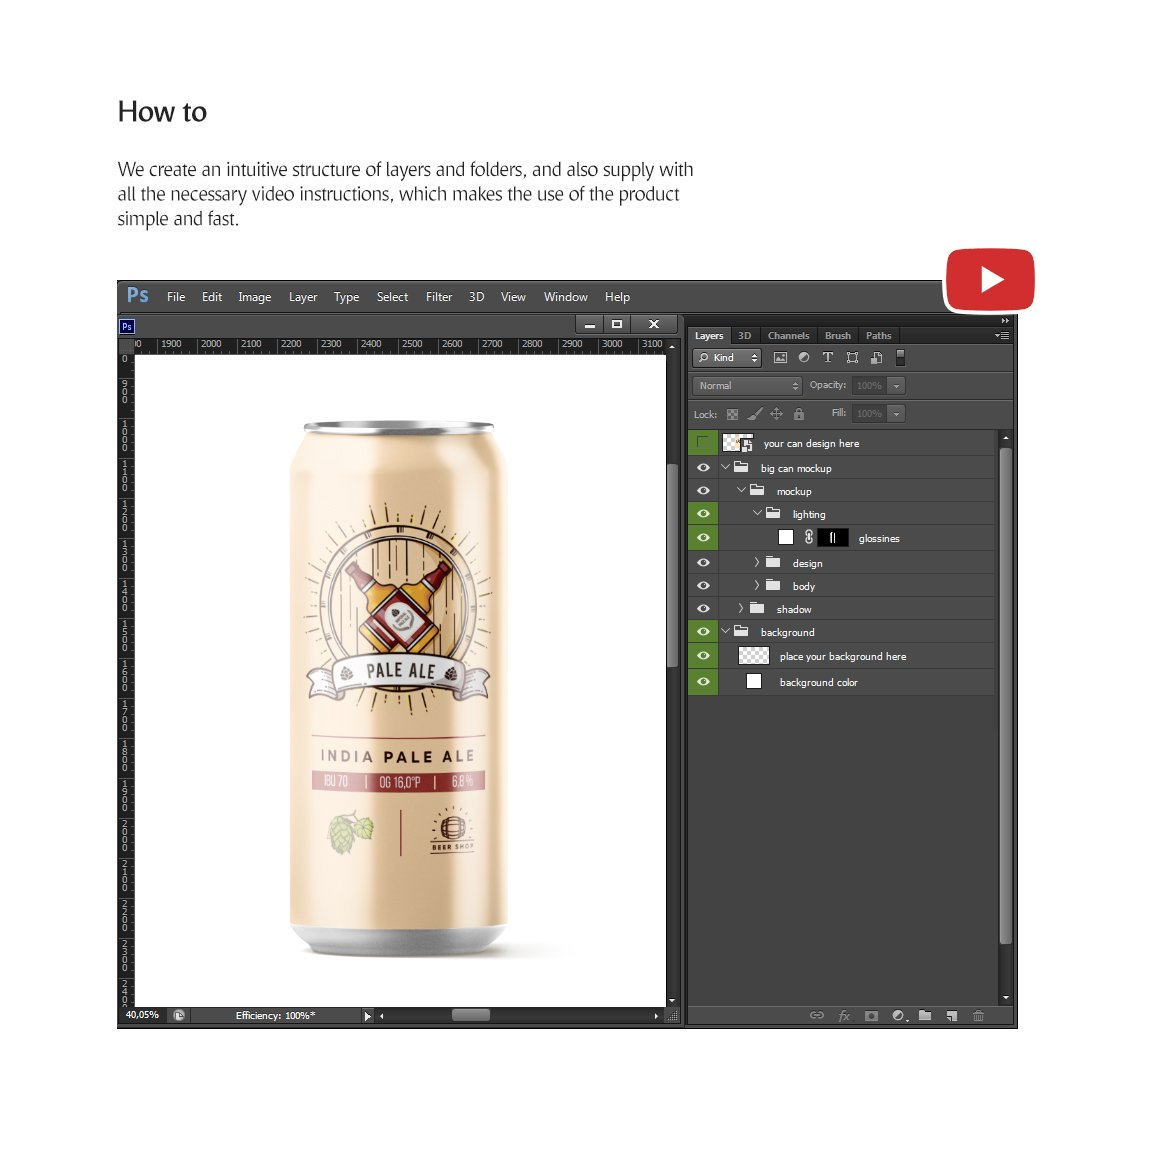 饮料汽水易拉罐锡罐设计动态展示样机 Soda Can Animated Mockup插图(5)